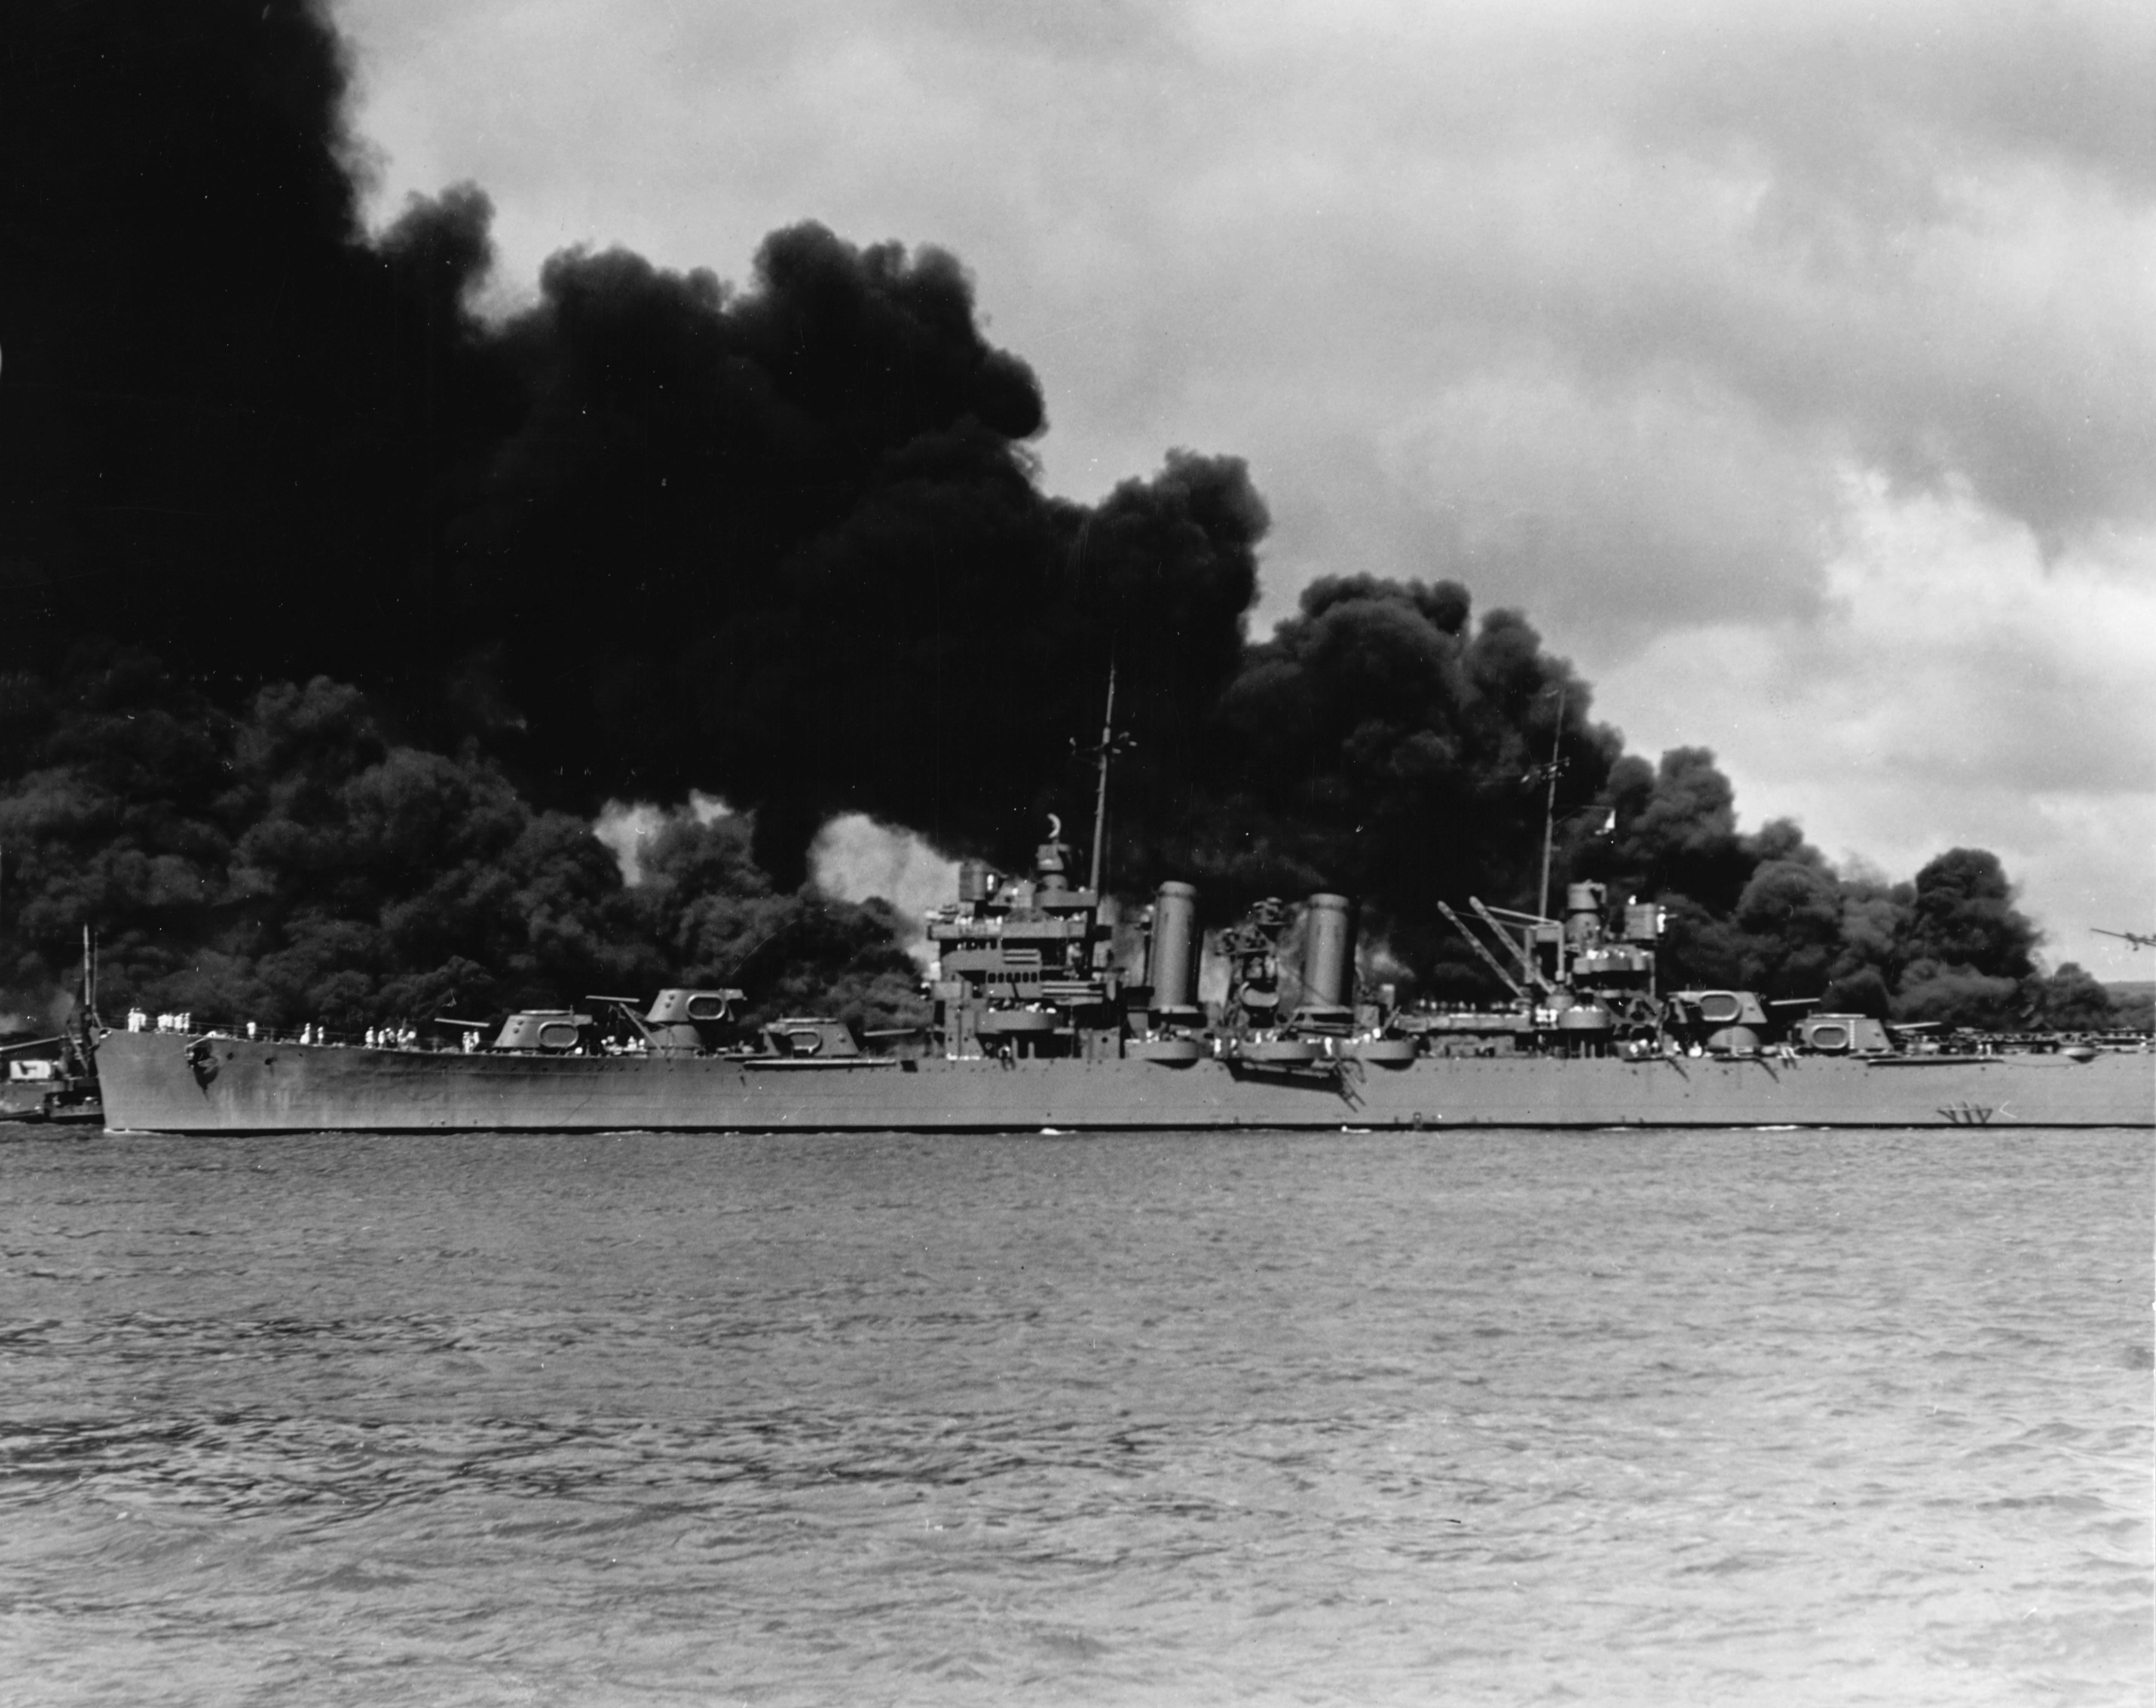 ARA General Belgrano - Wikipedia